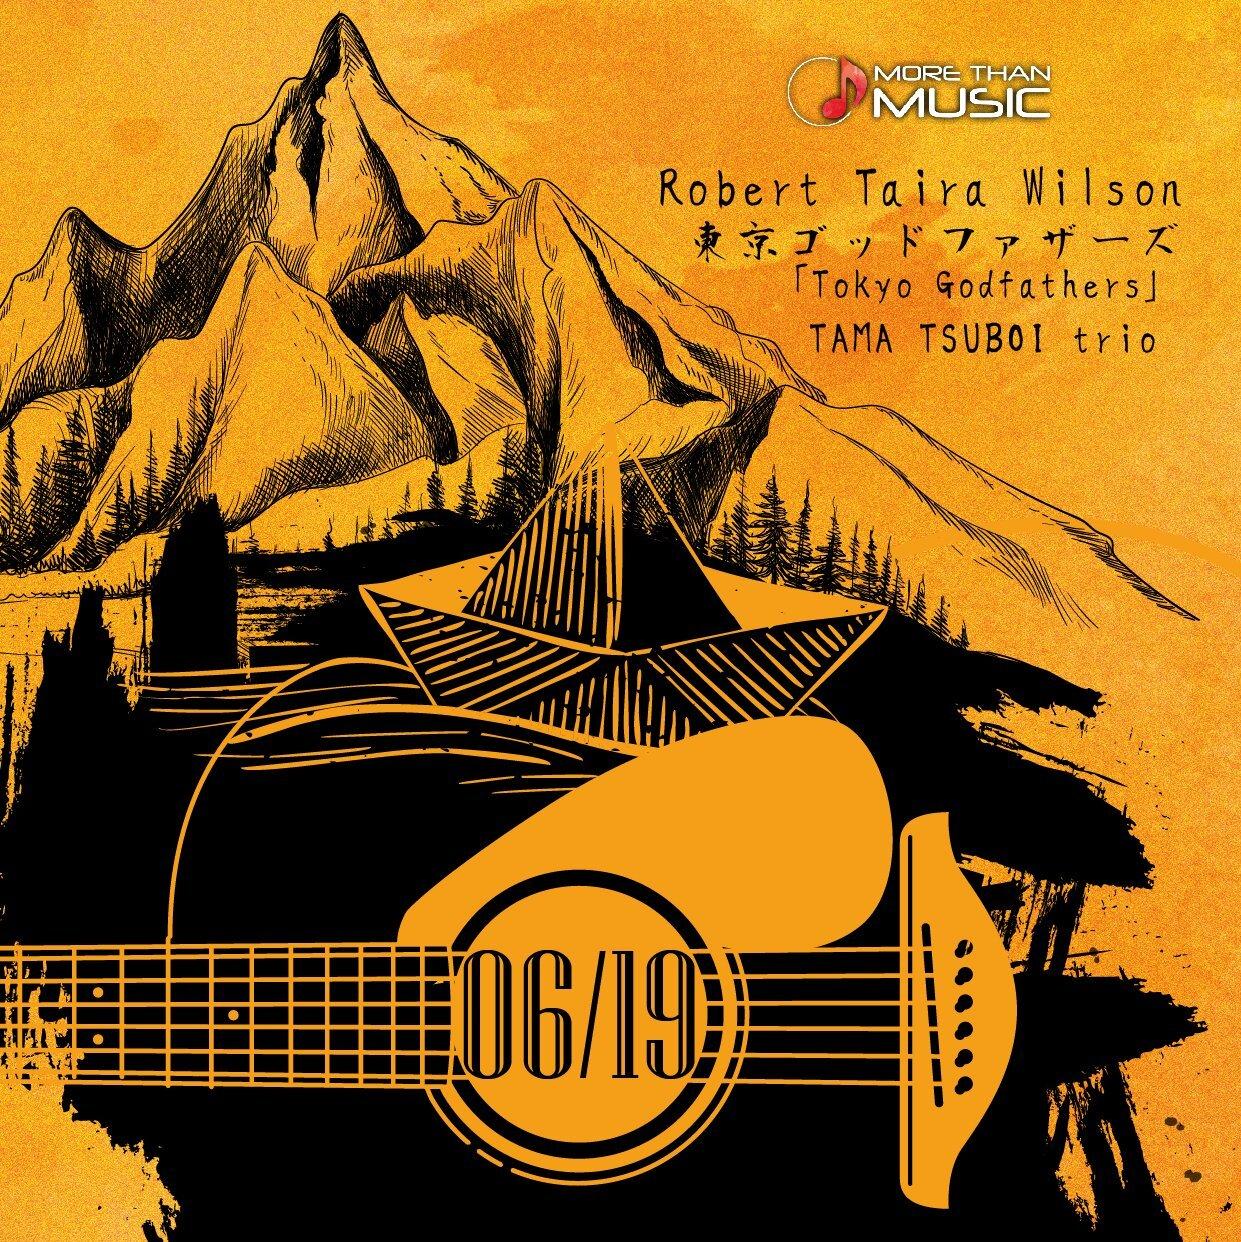 MTM Presents: Tama Tsuboi Trio, Robert Taira Wilson, Tokyo Godfathers